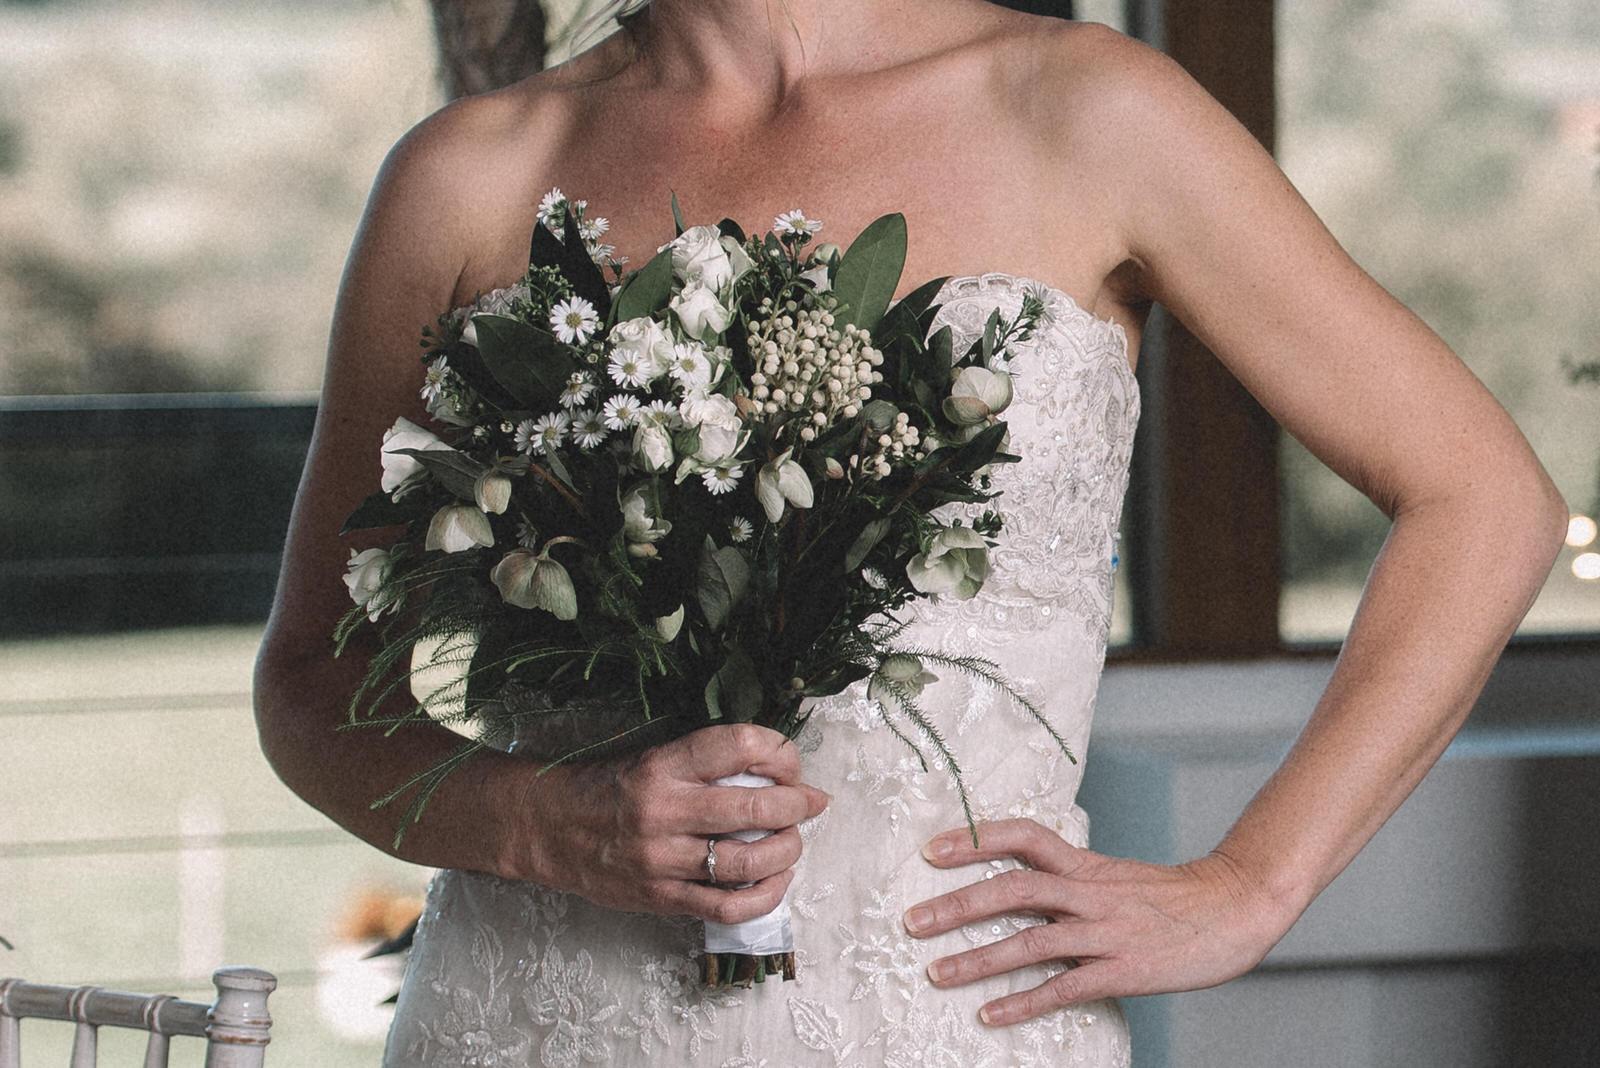 garden-weedon-woodland-bouquet-1